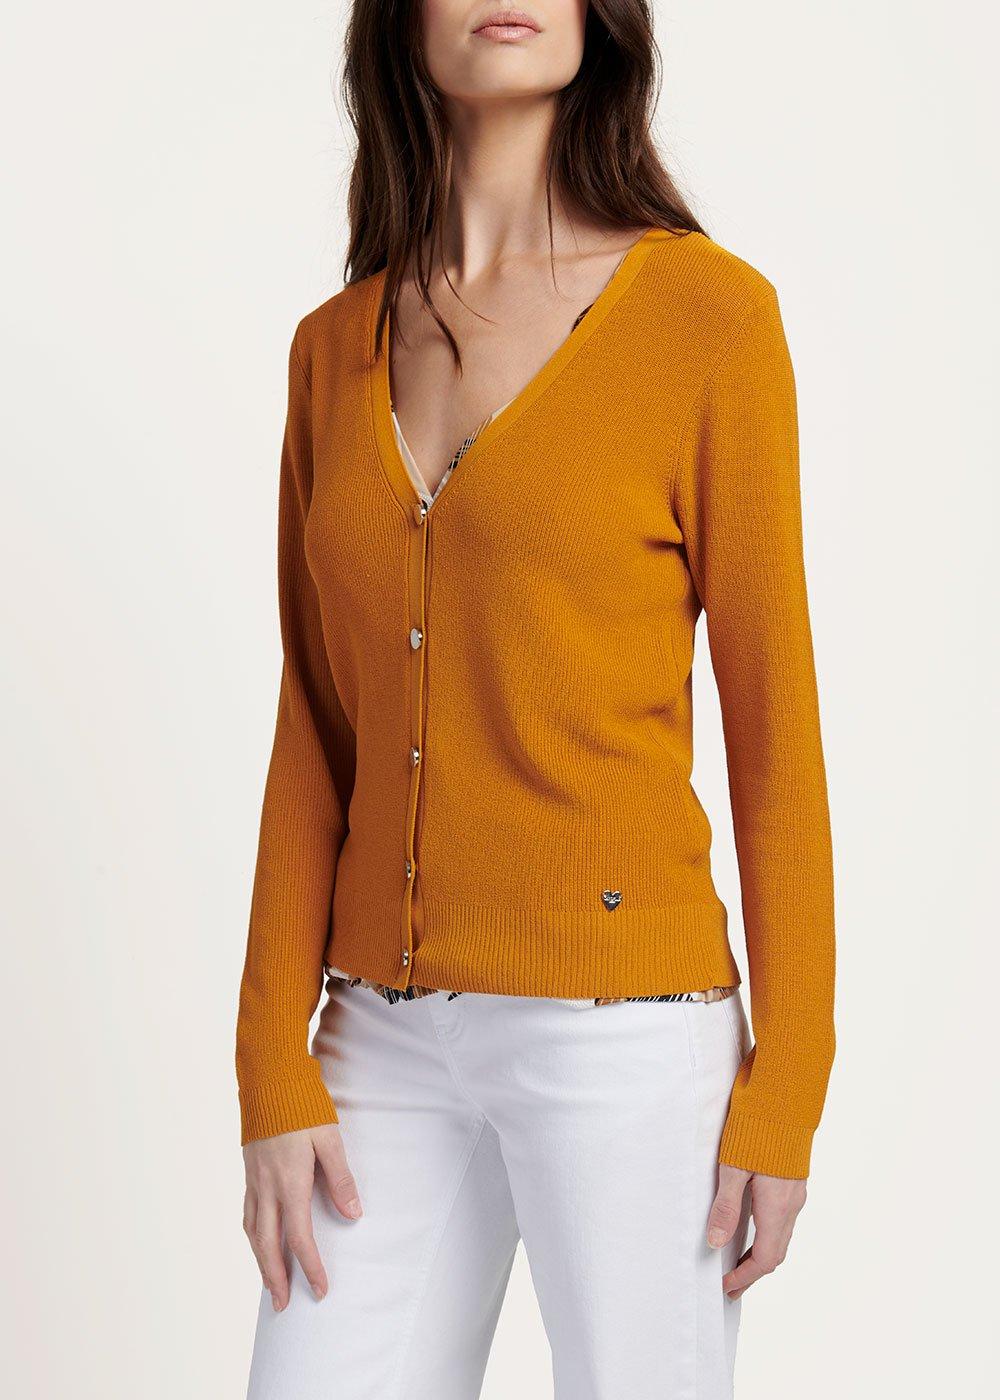 V-neck Can cardigan - Turmeric - Woman